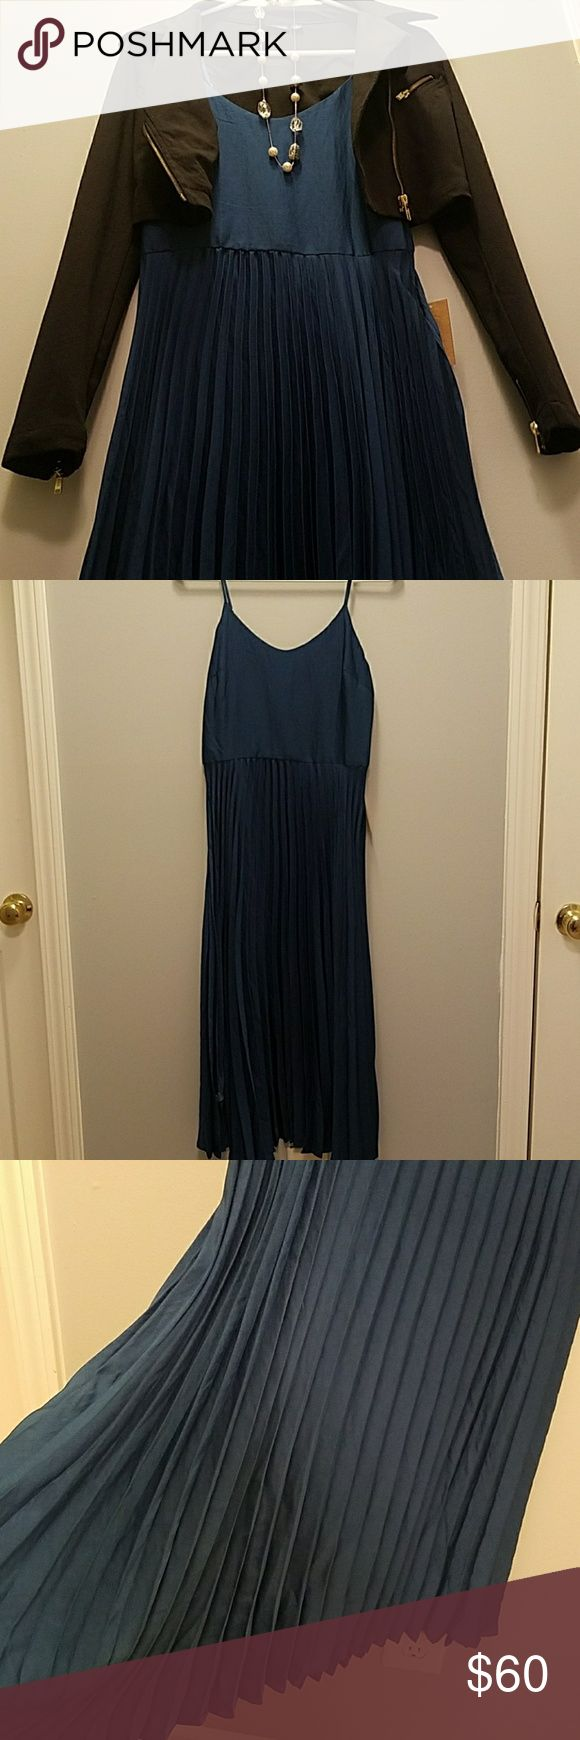 Rachel Roy Dress NWT Deep teal- Adjustable Spaghetti Strap- light weight- pleated flowy skirt with solid top-Glossy look- Super Cute!! RACHEL Rachel Roy Dresses Midi